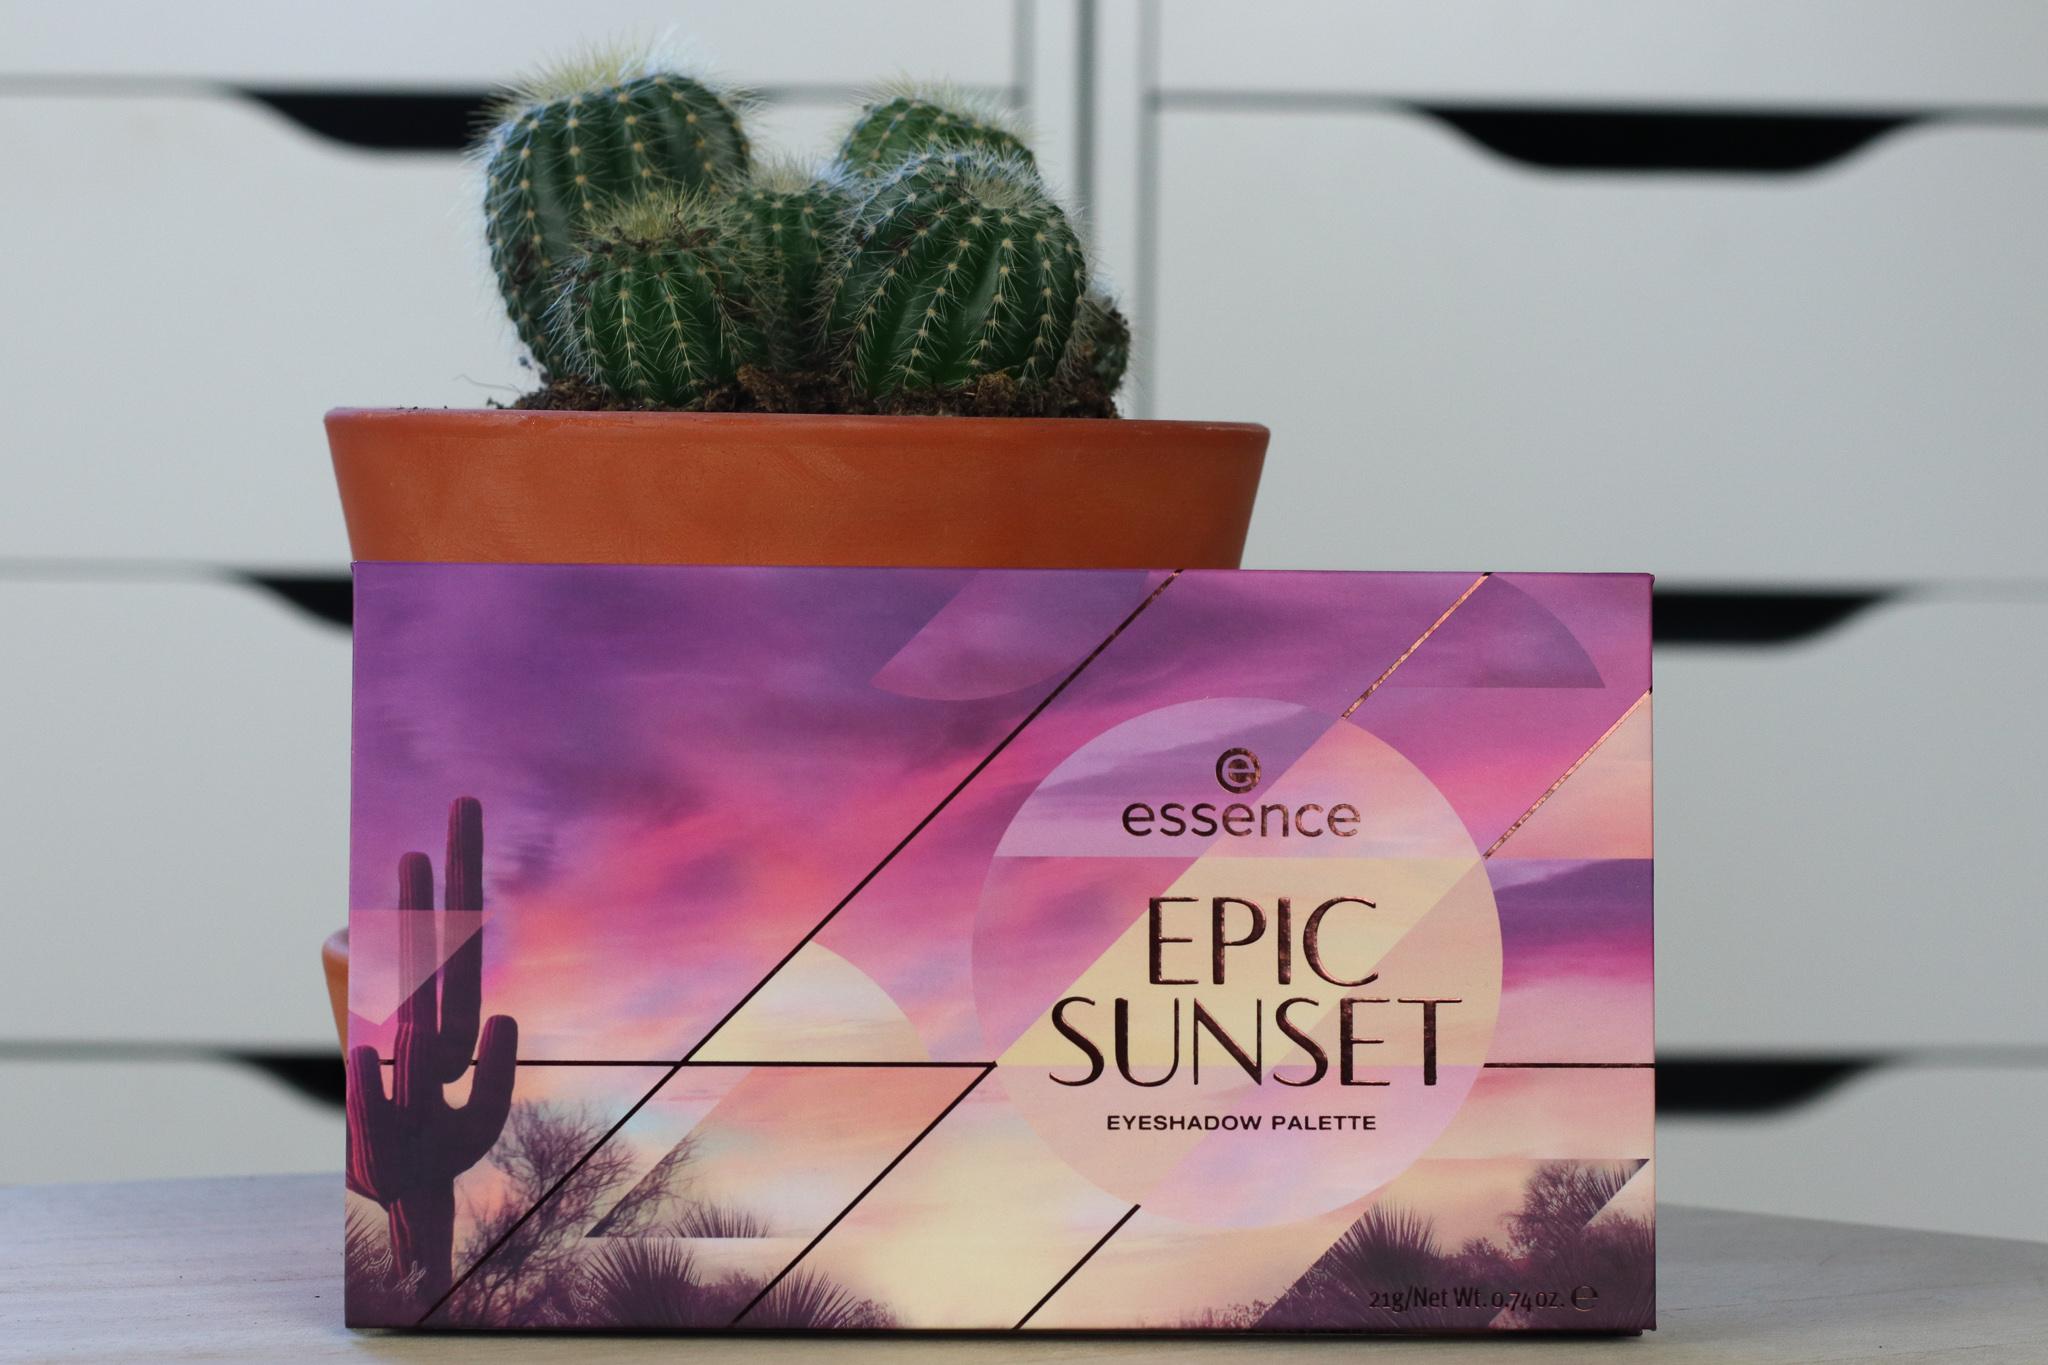 Essence Epic Sunset oogschaduw palette